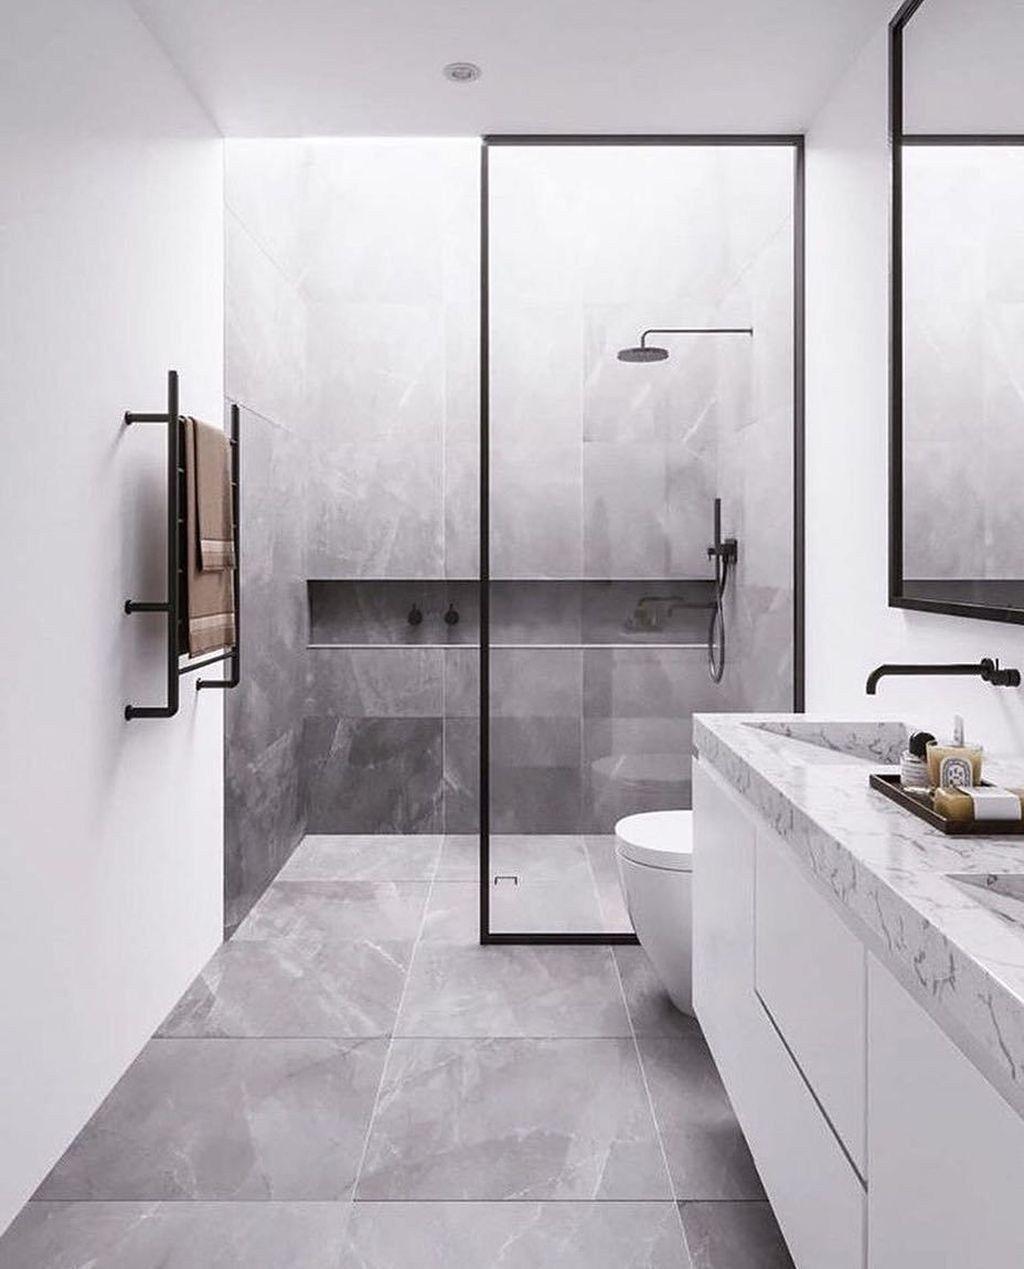 30 Cute Minimalist Bathroom Design Ideas For Your Inspiration